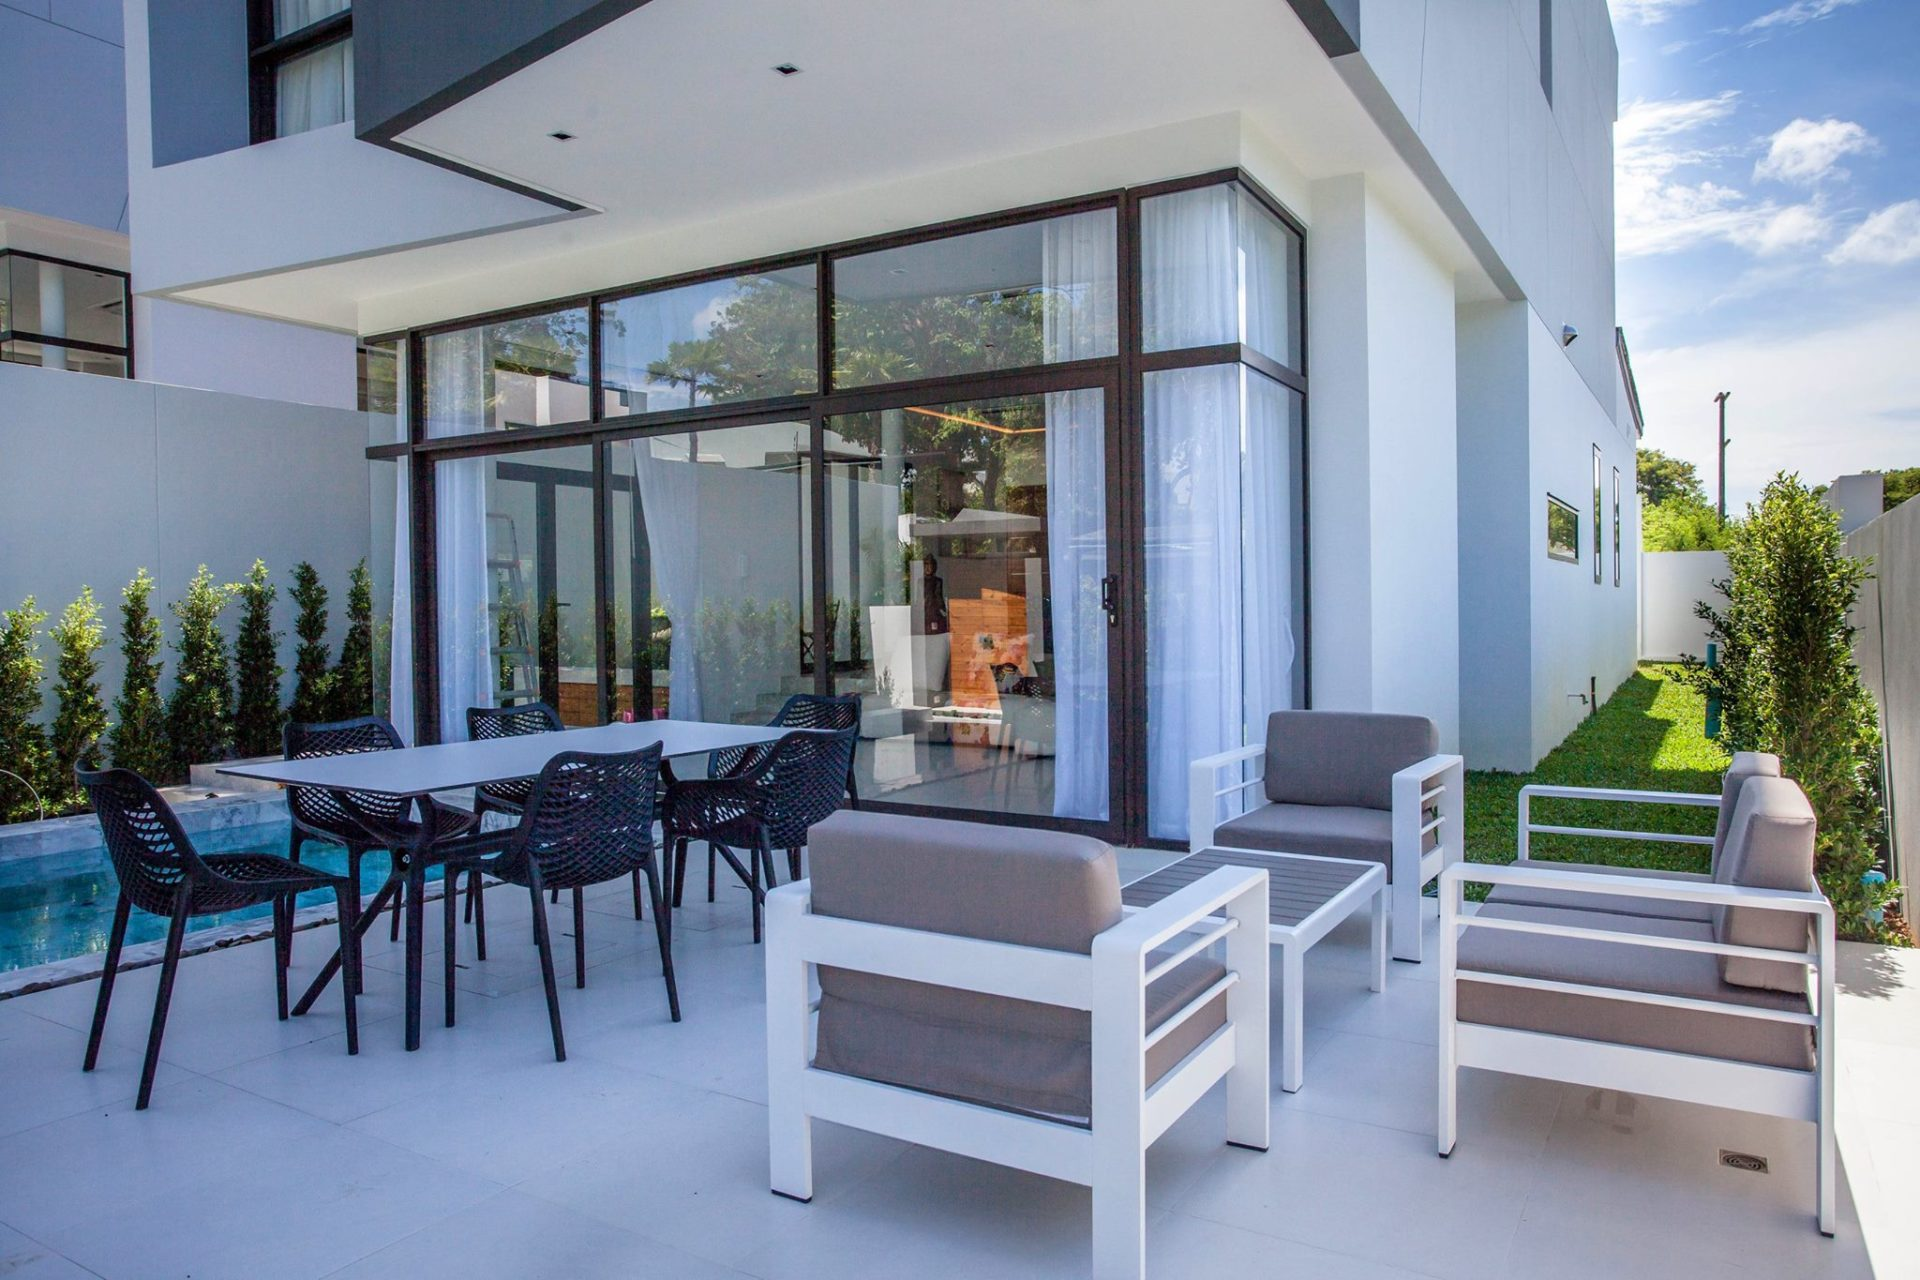 Phuket Real Estate Agency – Nai Harn Beach (20)